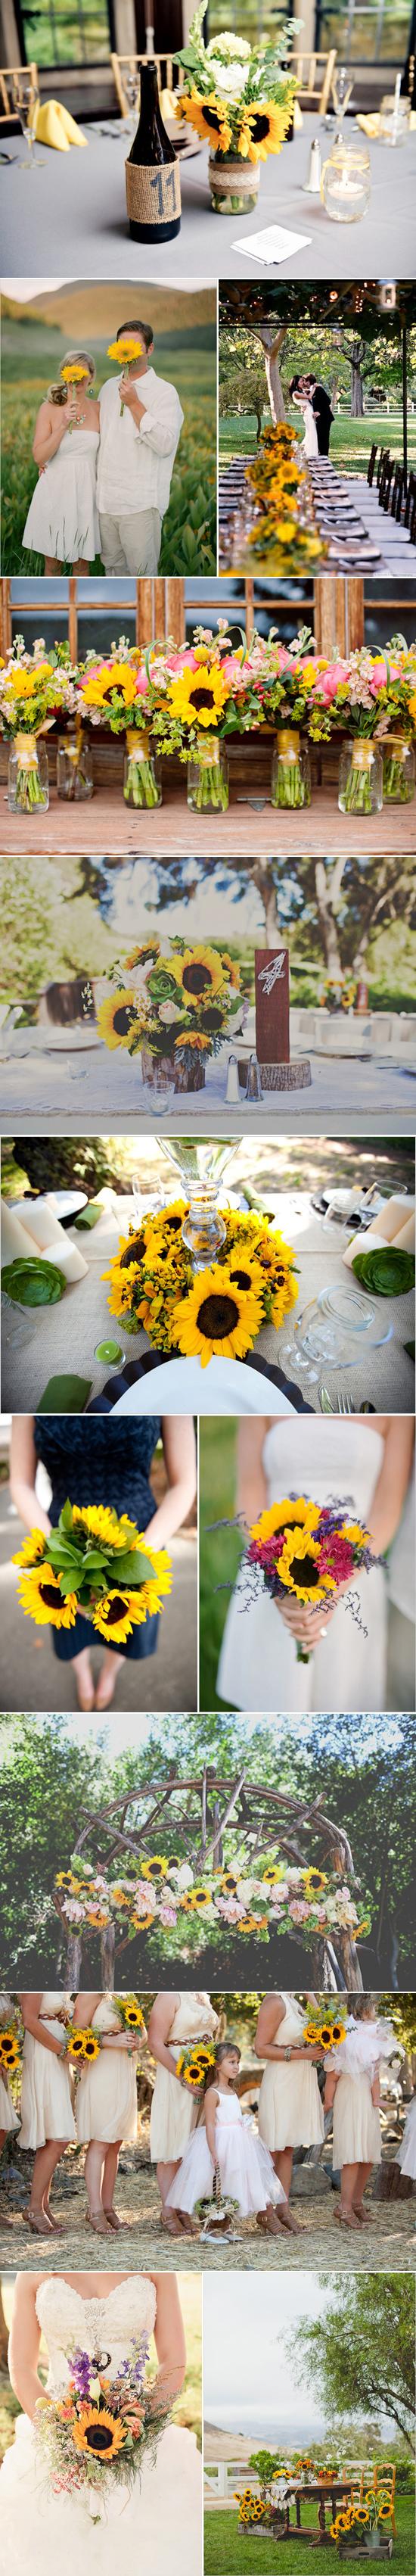 sunflower wedding inspiration02